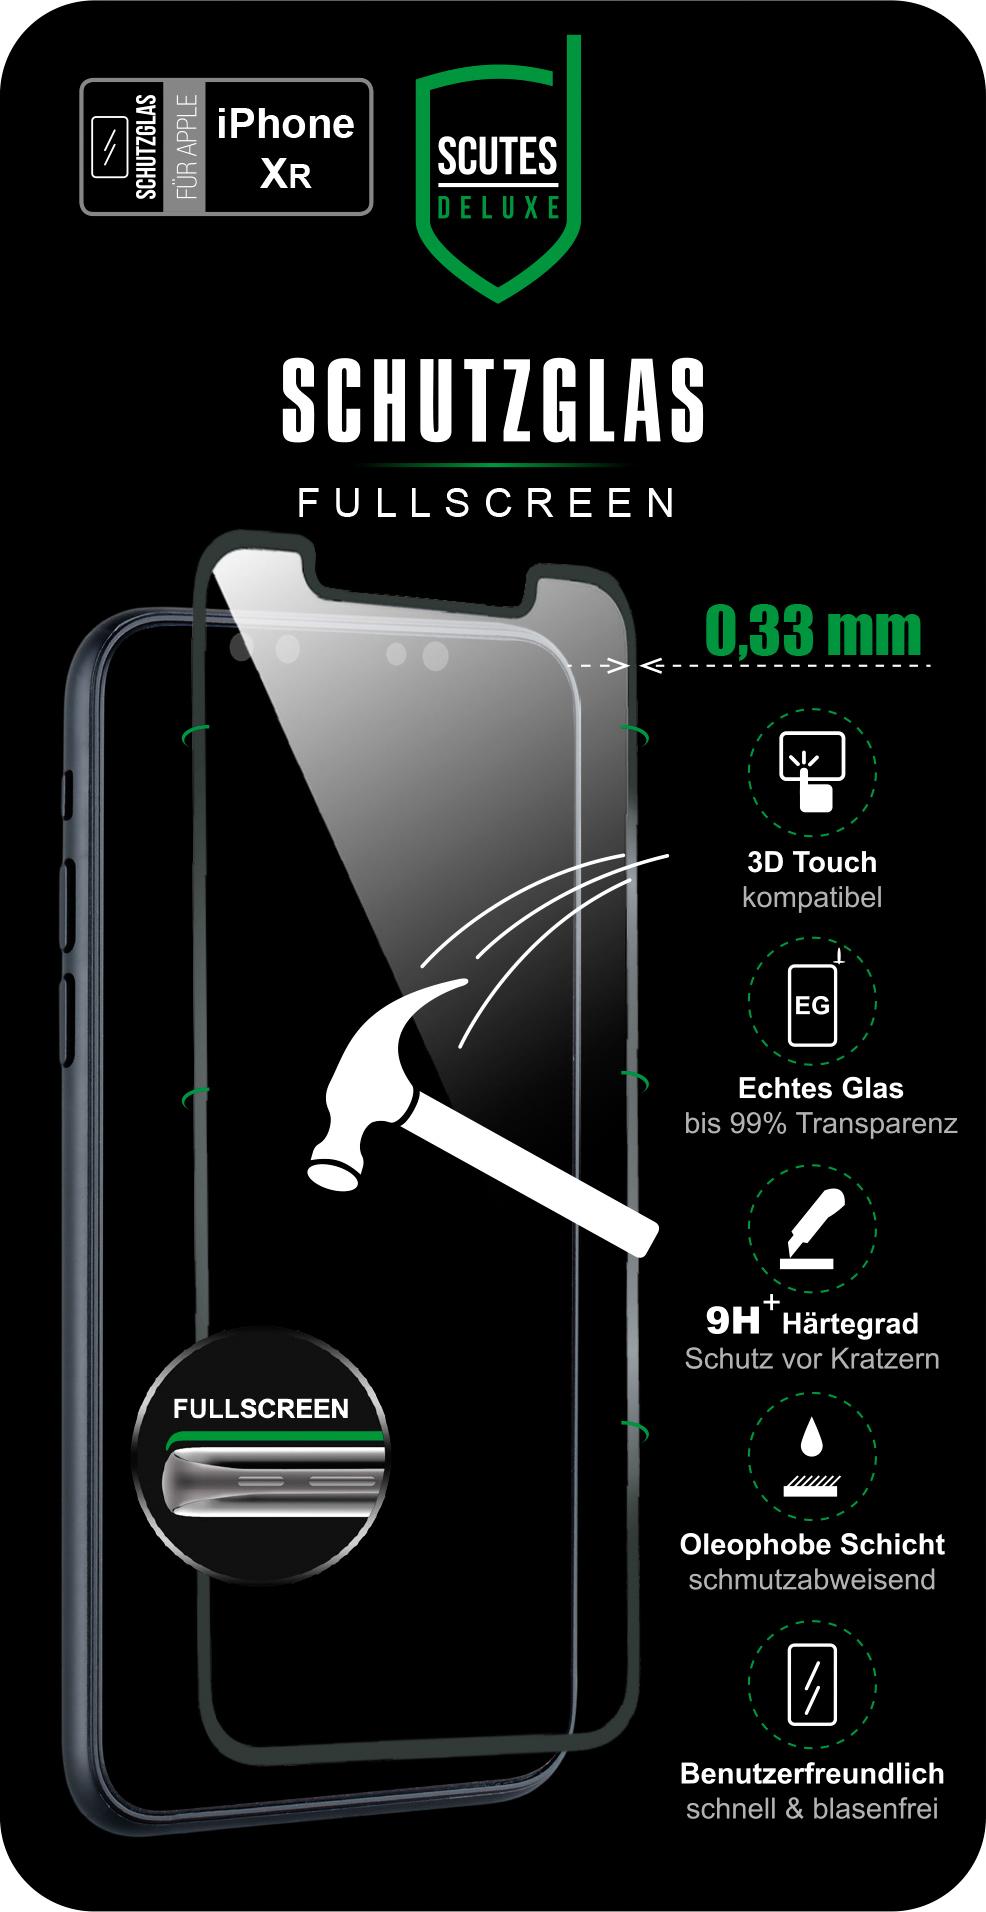 Fullscreen Schutzglas (iPhone XR)